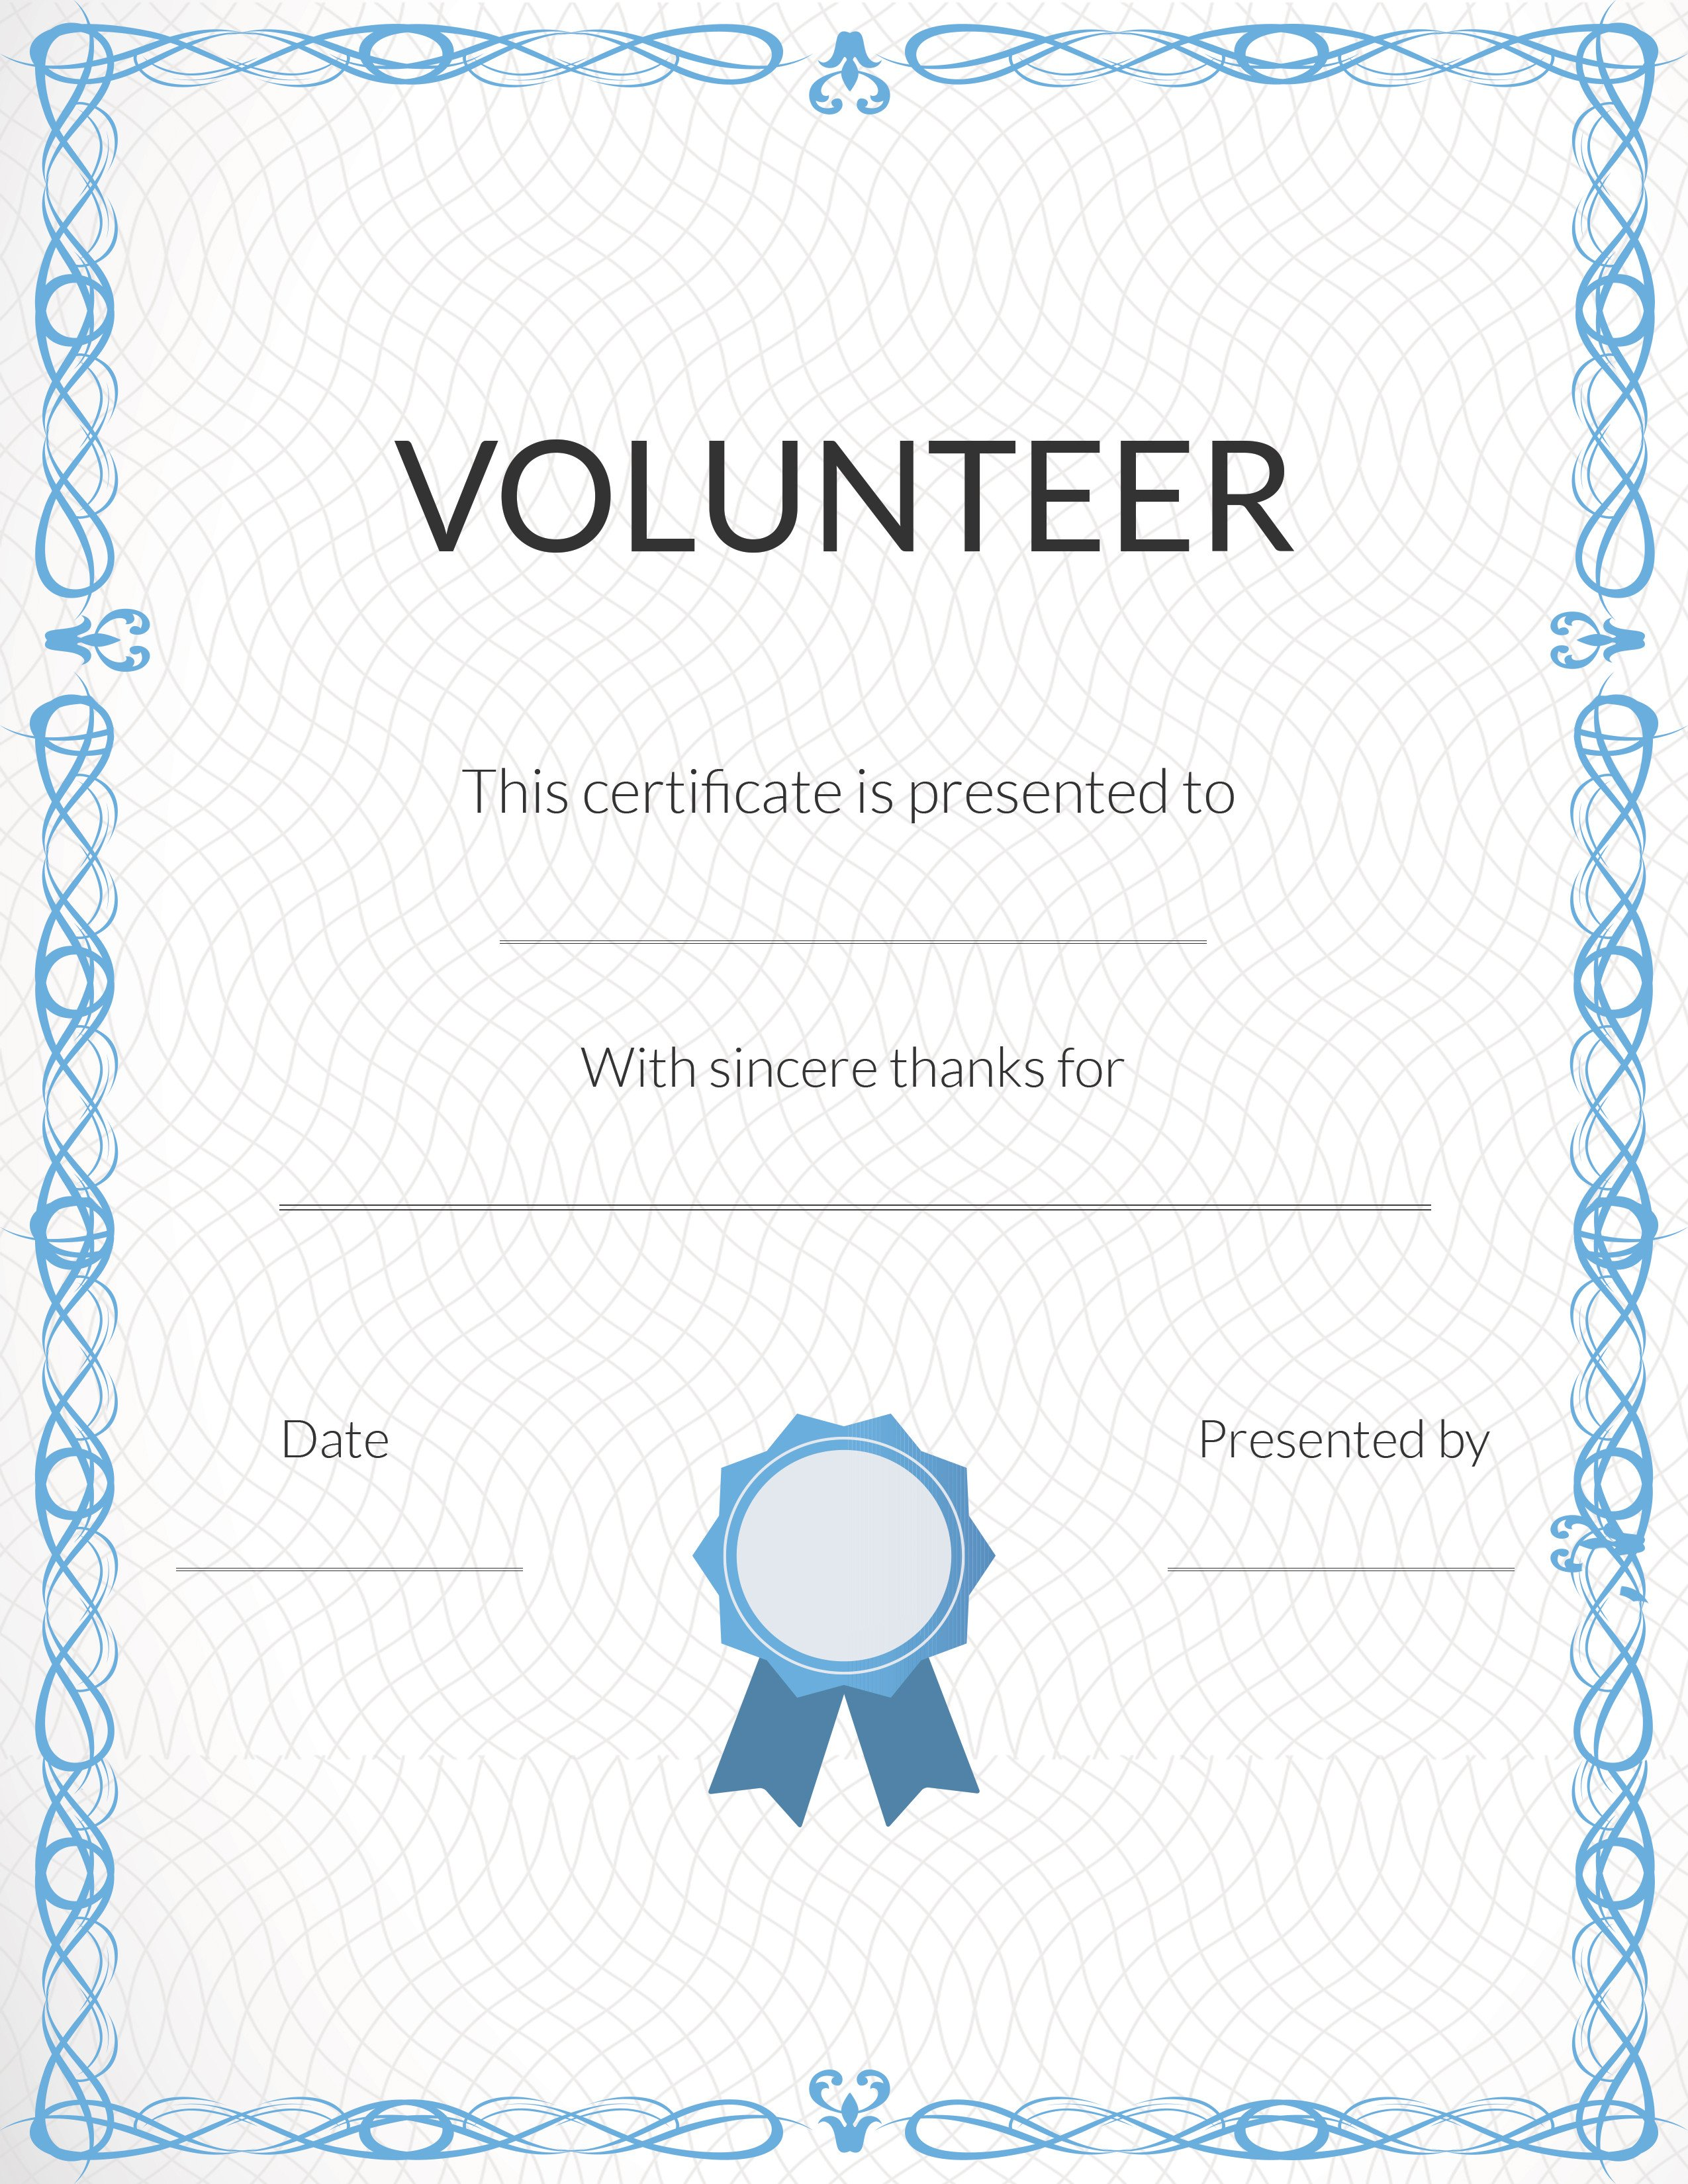 Volunteer Certificate Of Appreciation Free Printable Volunteer Appreciation Certificates